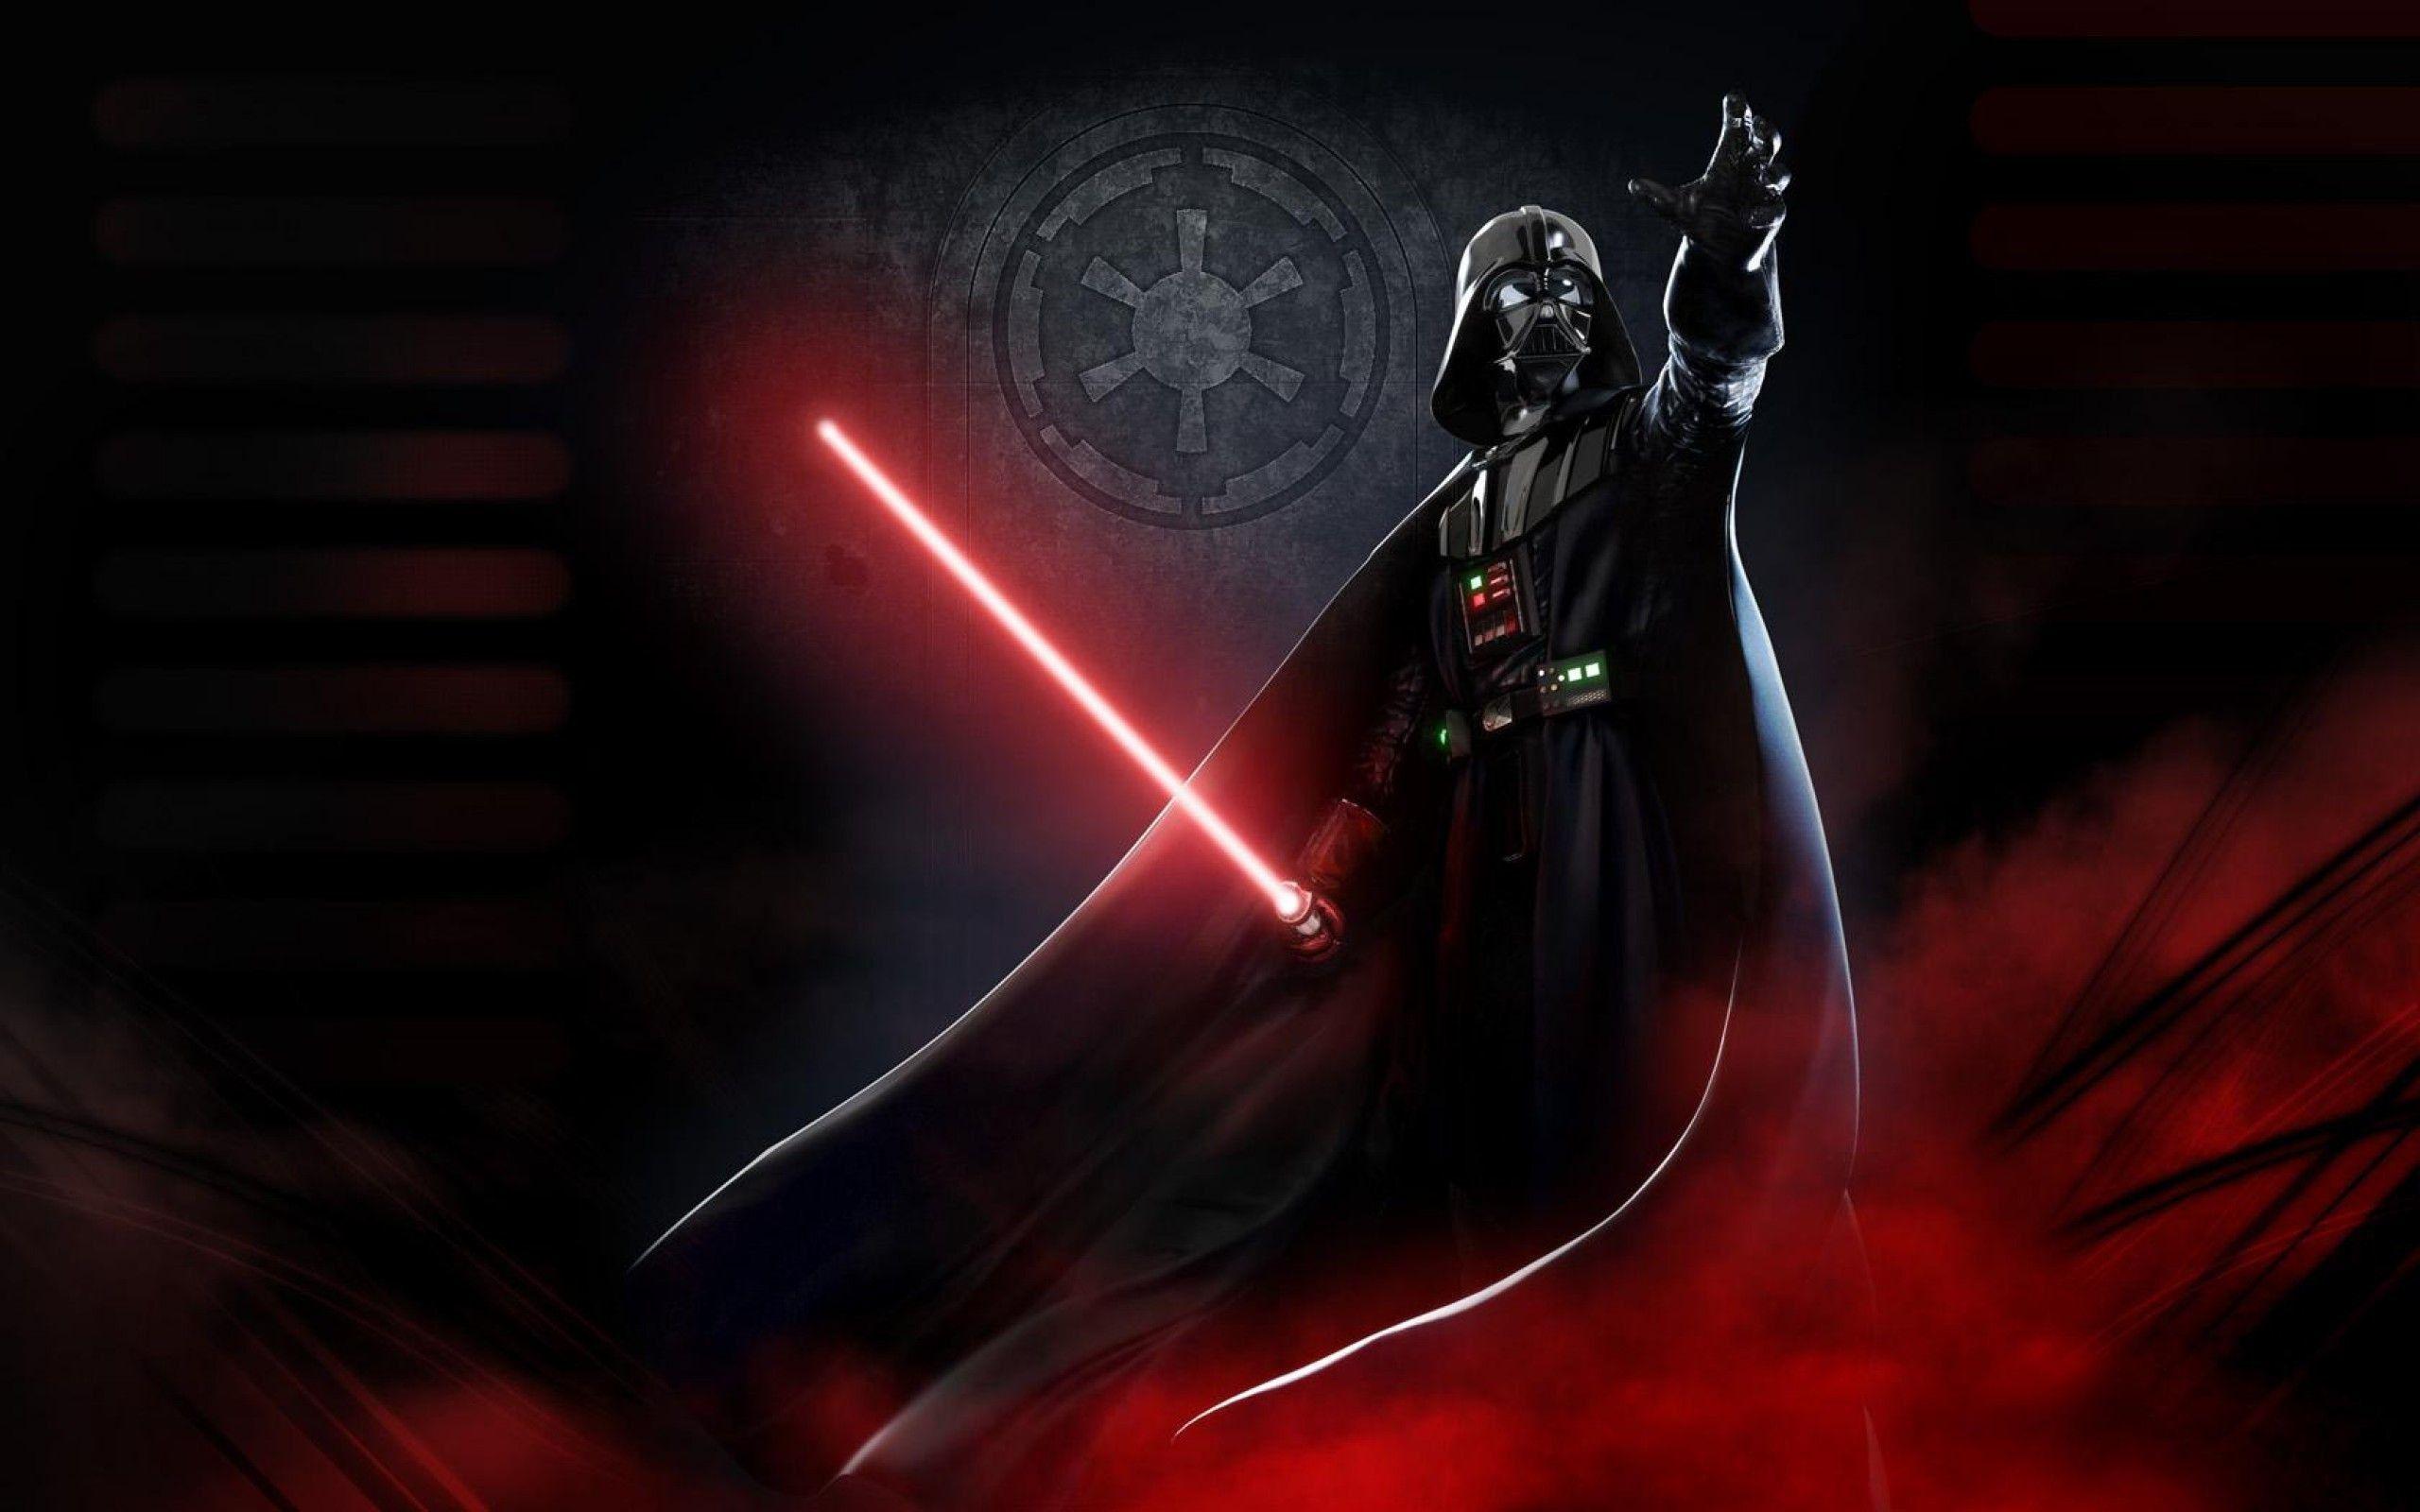 Darth Vader Wallpapers   Top Darth Vader Backgrounds 2560x1600